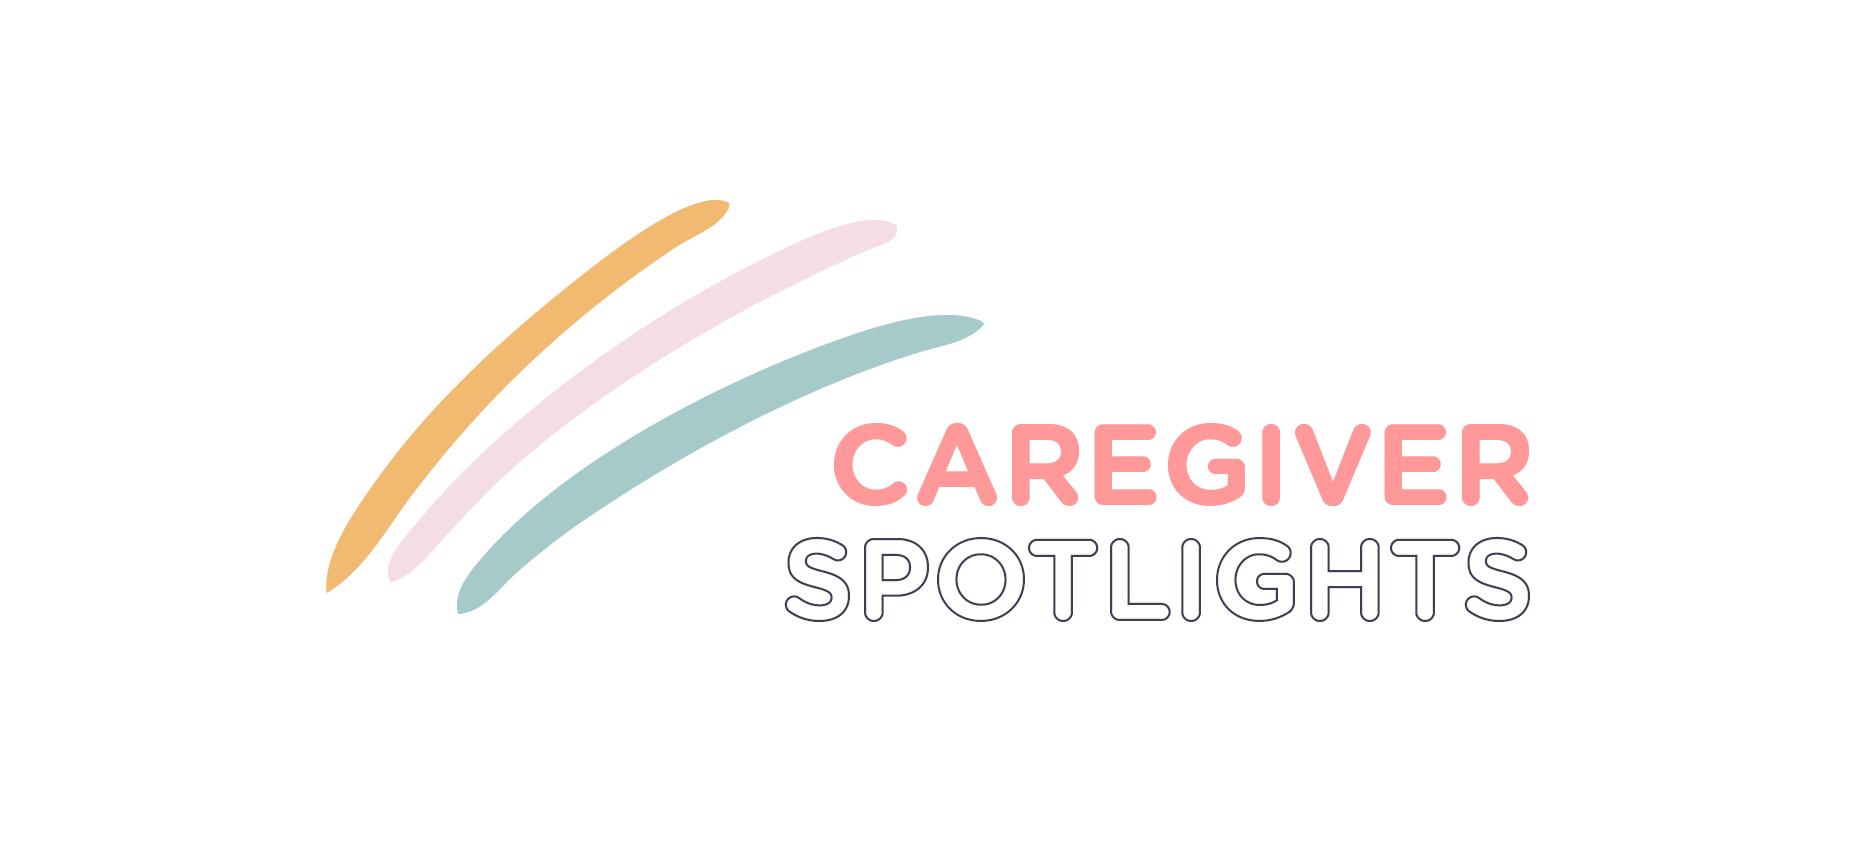 caregiver spotlights